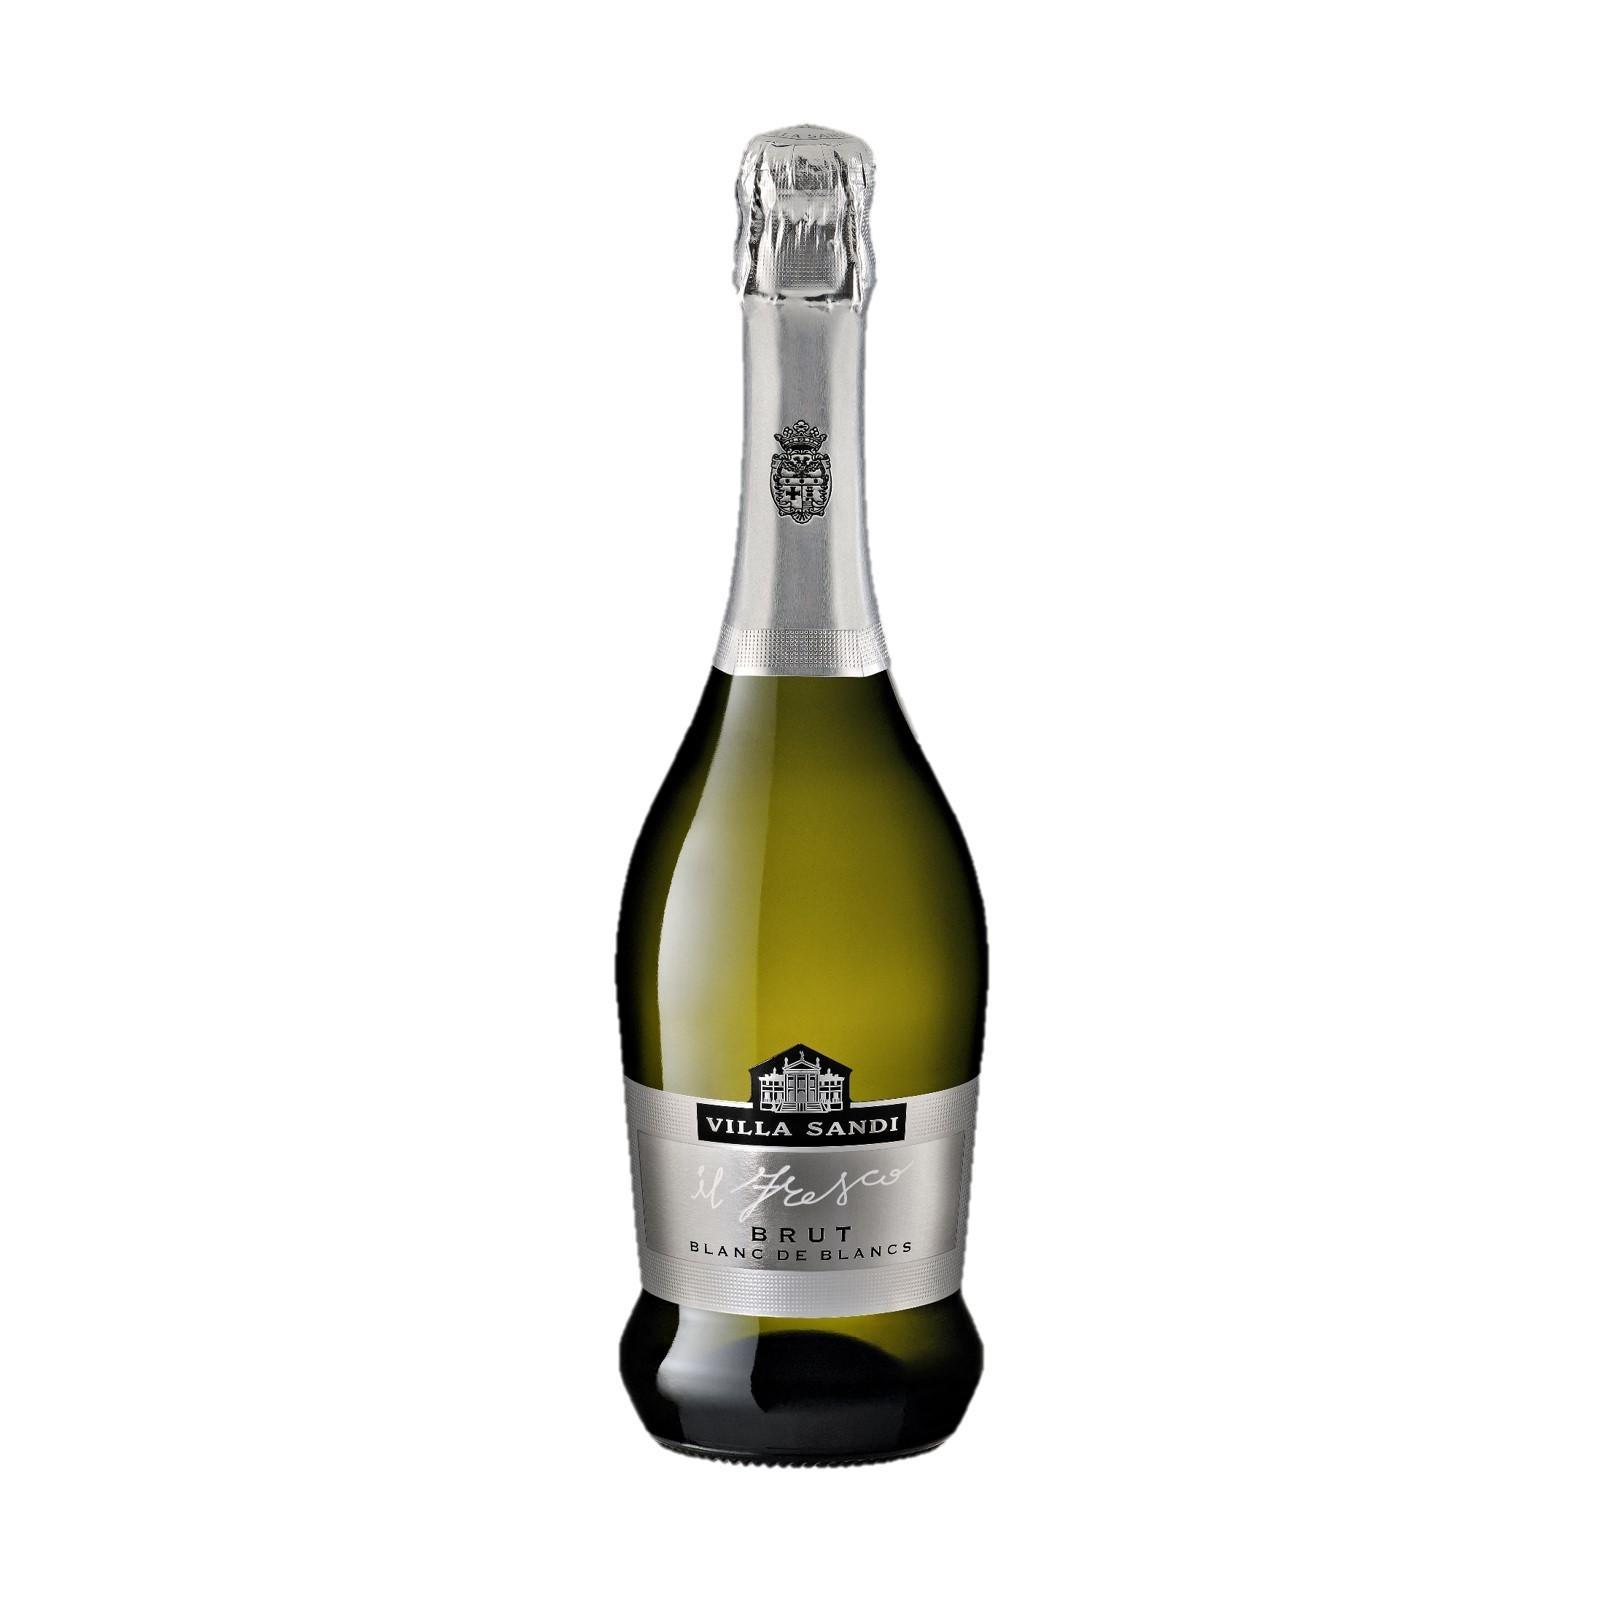 Villa Sandi Brut Blanc de Blanc Sparkling